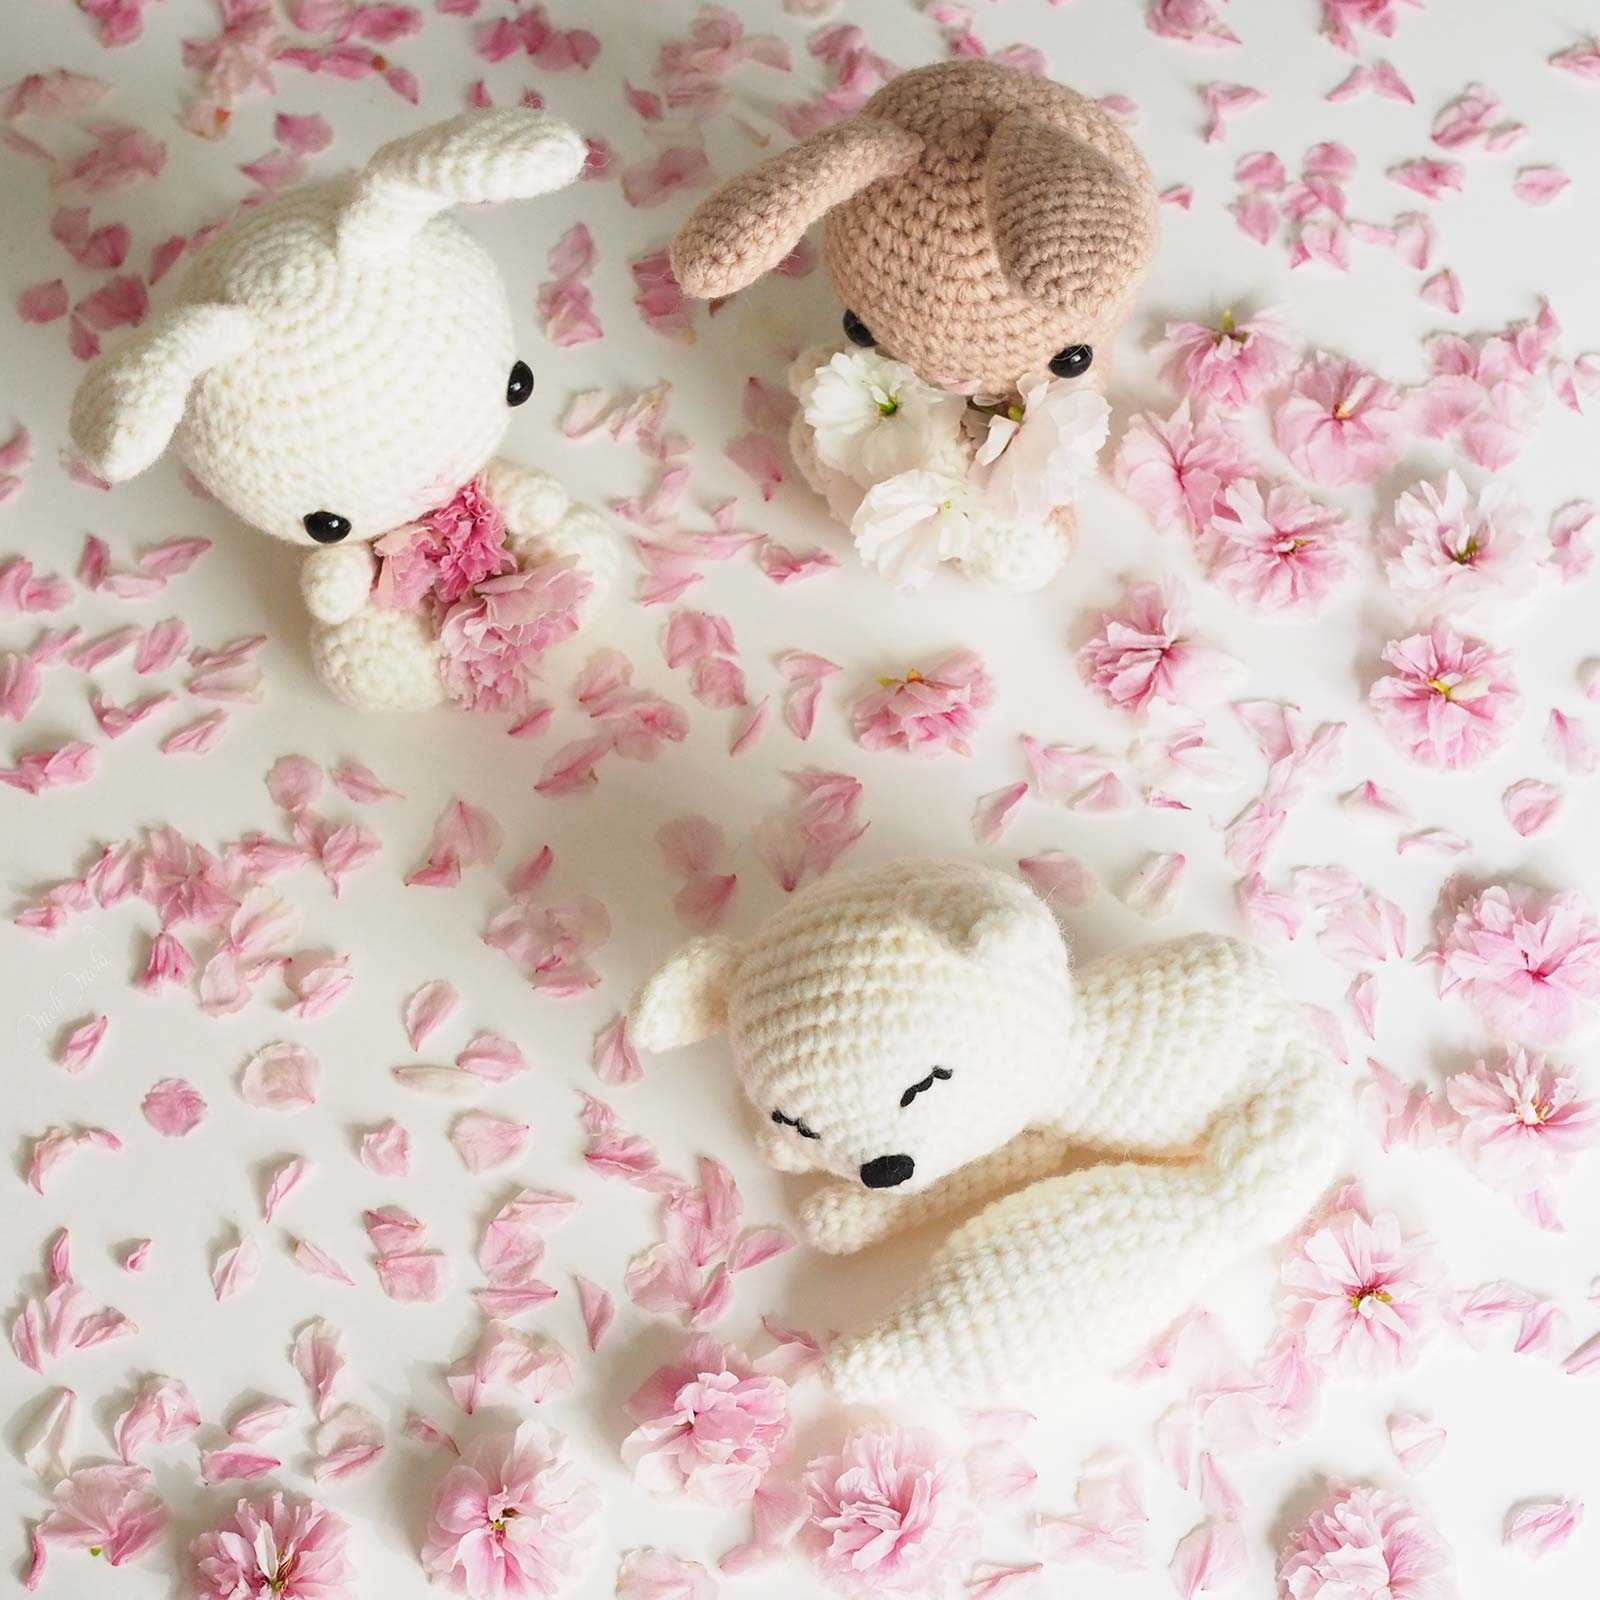 lapins renard crochet laine ricodesign wool alpaca prunus sakura laboutiquedemelimelo